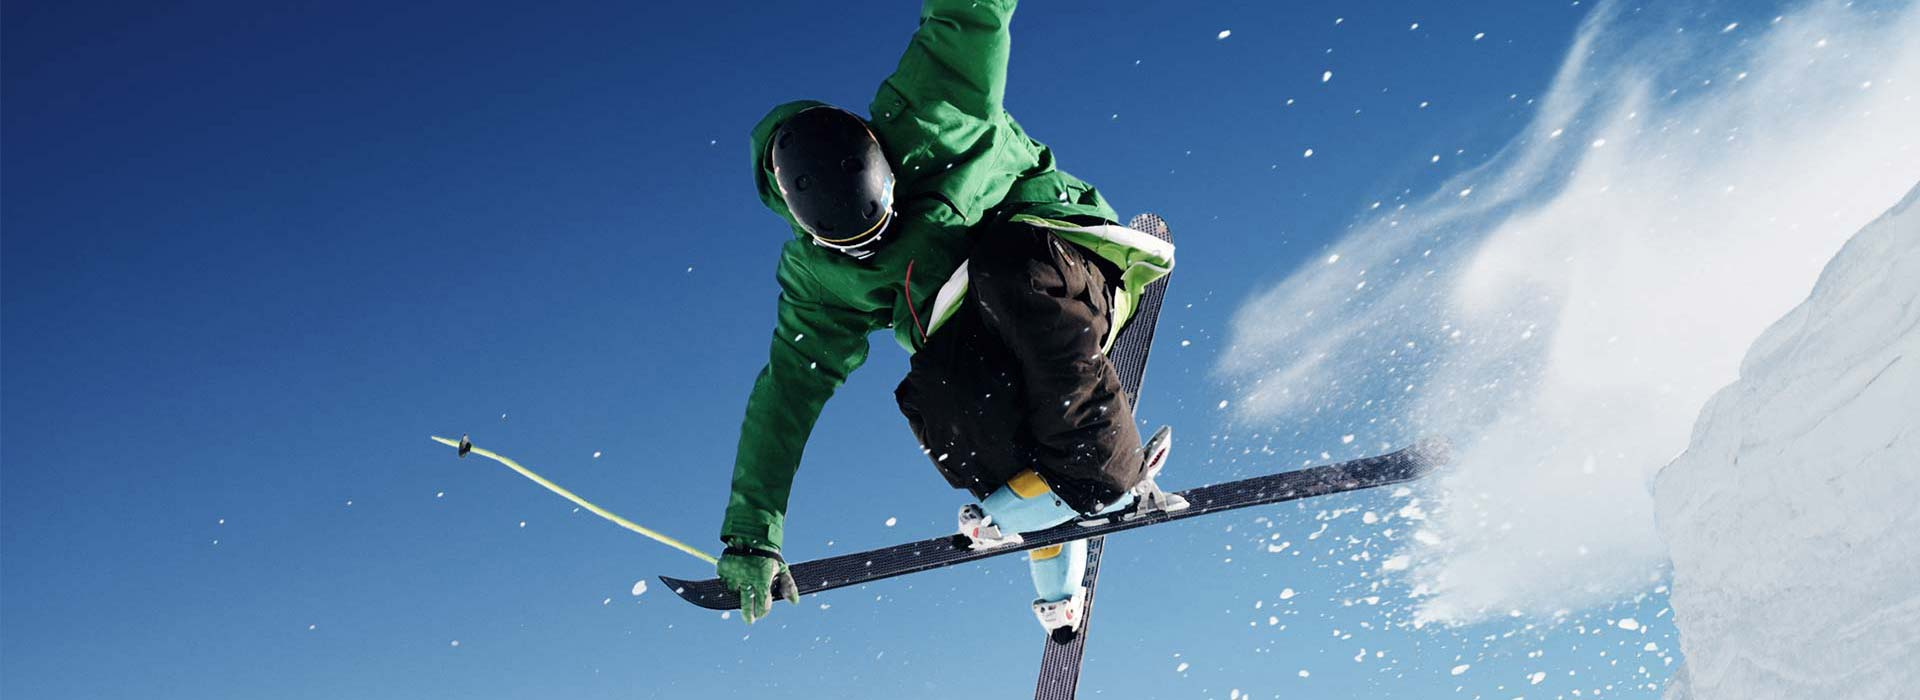 hyra skidor sälen priser